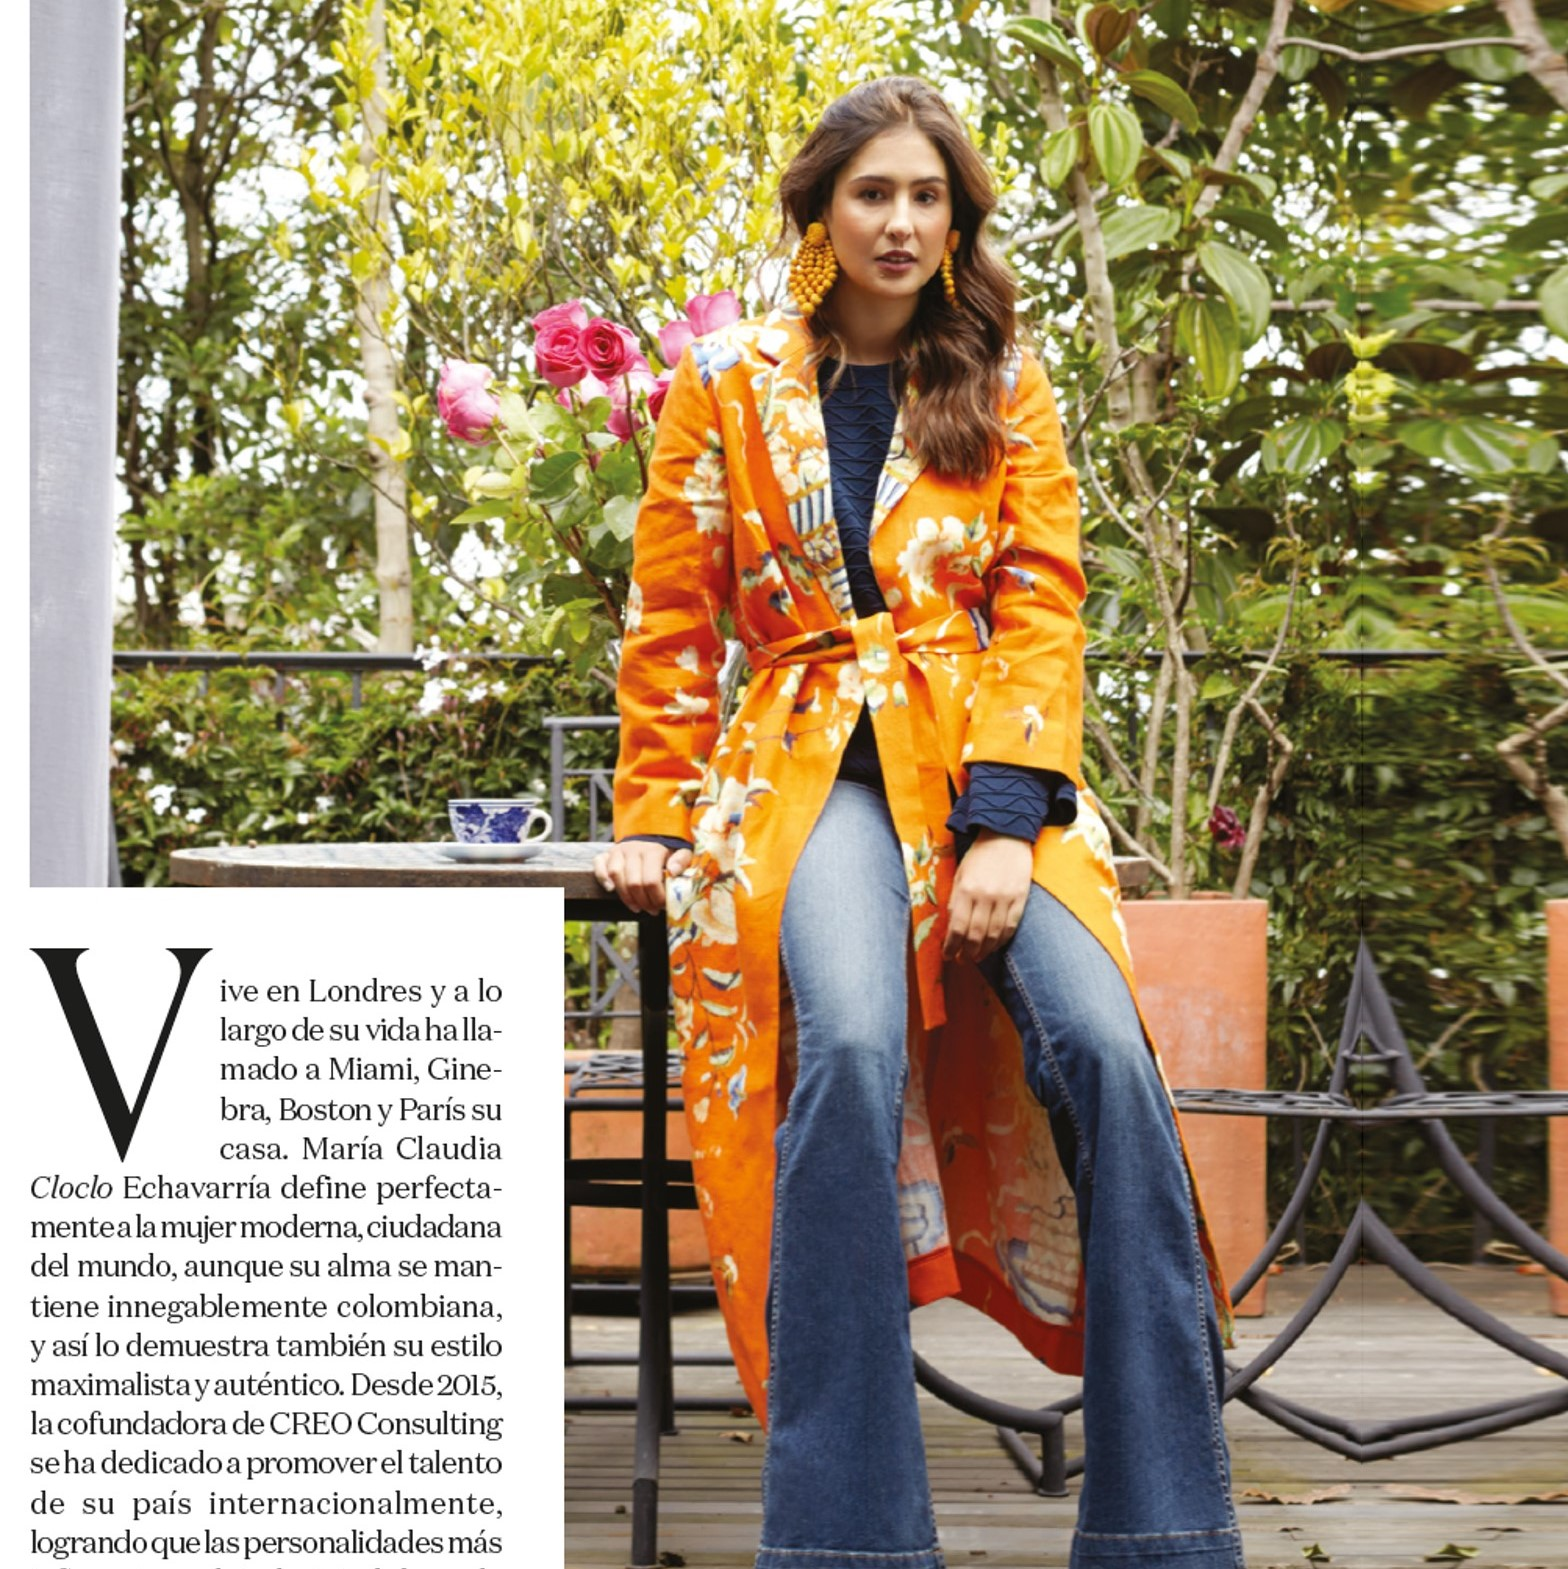 CLO CLO ECHAVARRIA - Calor y Rosas Kimono  #creativeconsultant #creoconsulting #almagirl #girlboss  @ her apartment in Bogota, Colombia